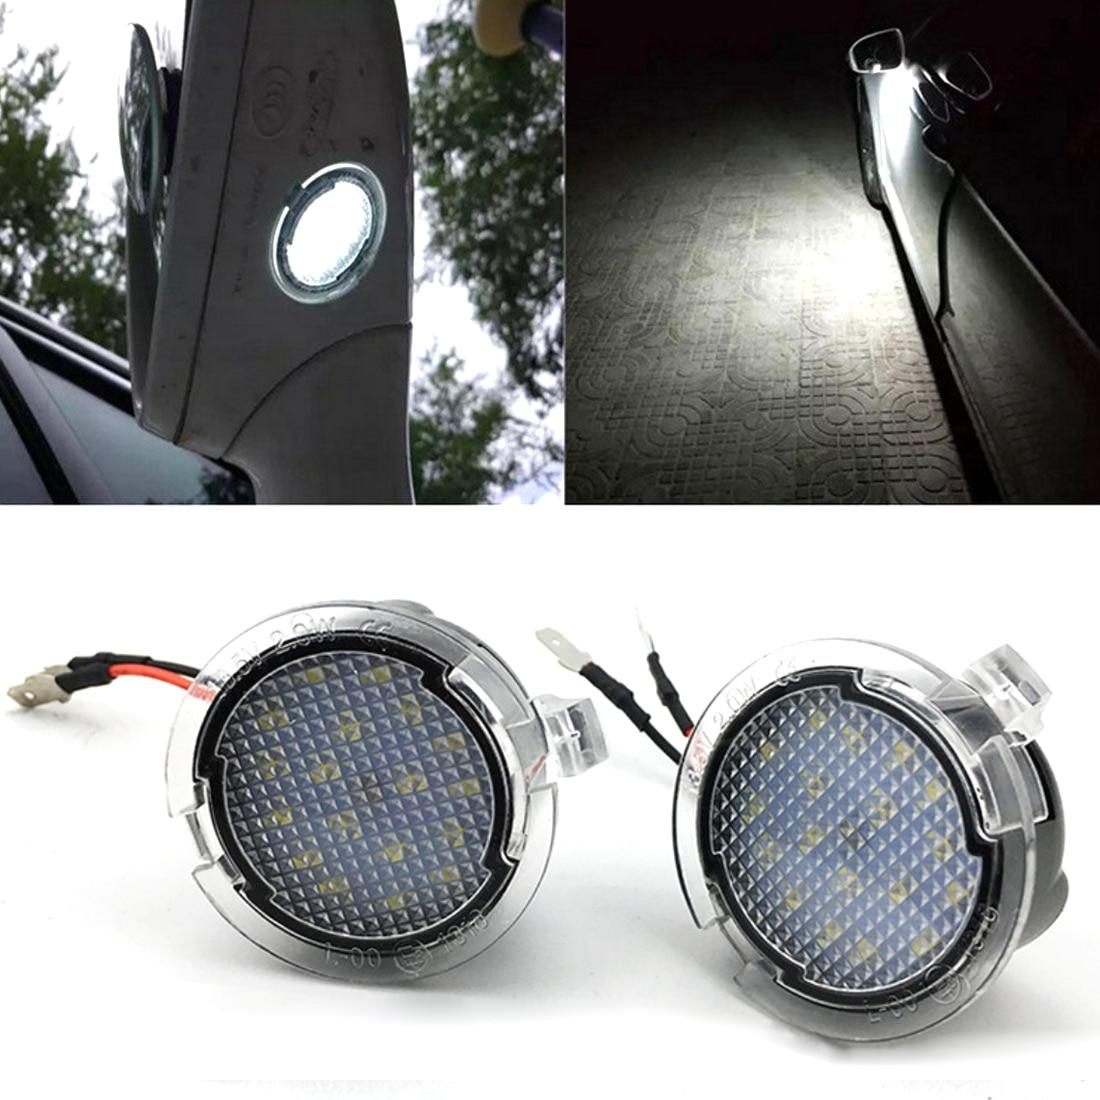 Niscarda 2Pcs Under Mirror Puddle Light For ford Edge Fusion Flex Explorer Mondeo Taurus F-150 Expedition Super bright Auto Lamp